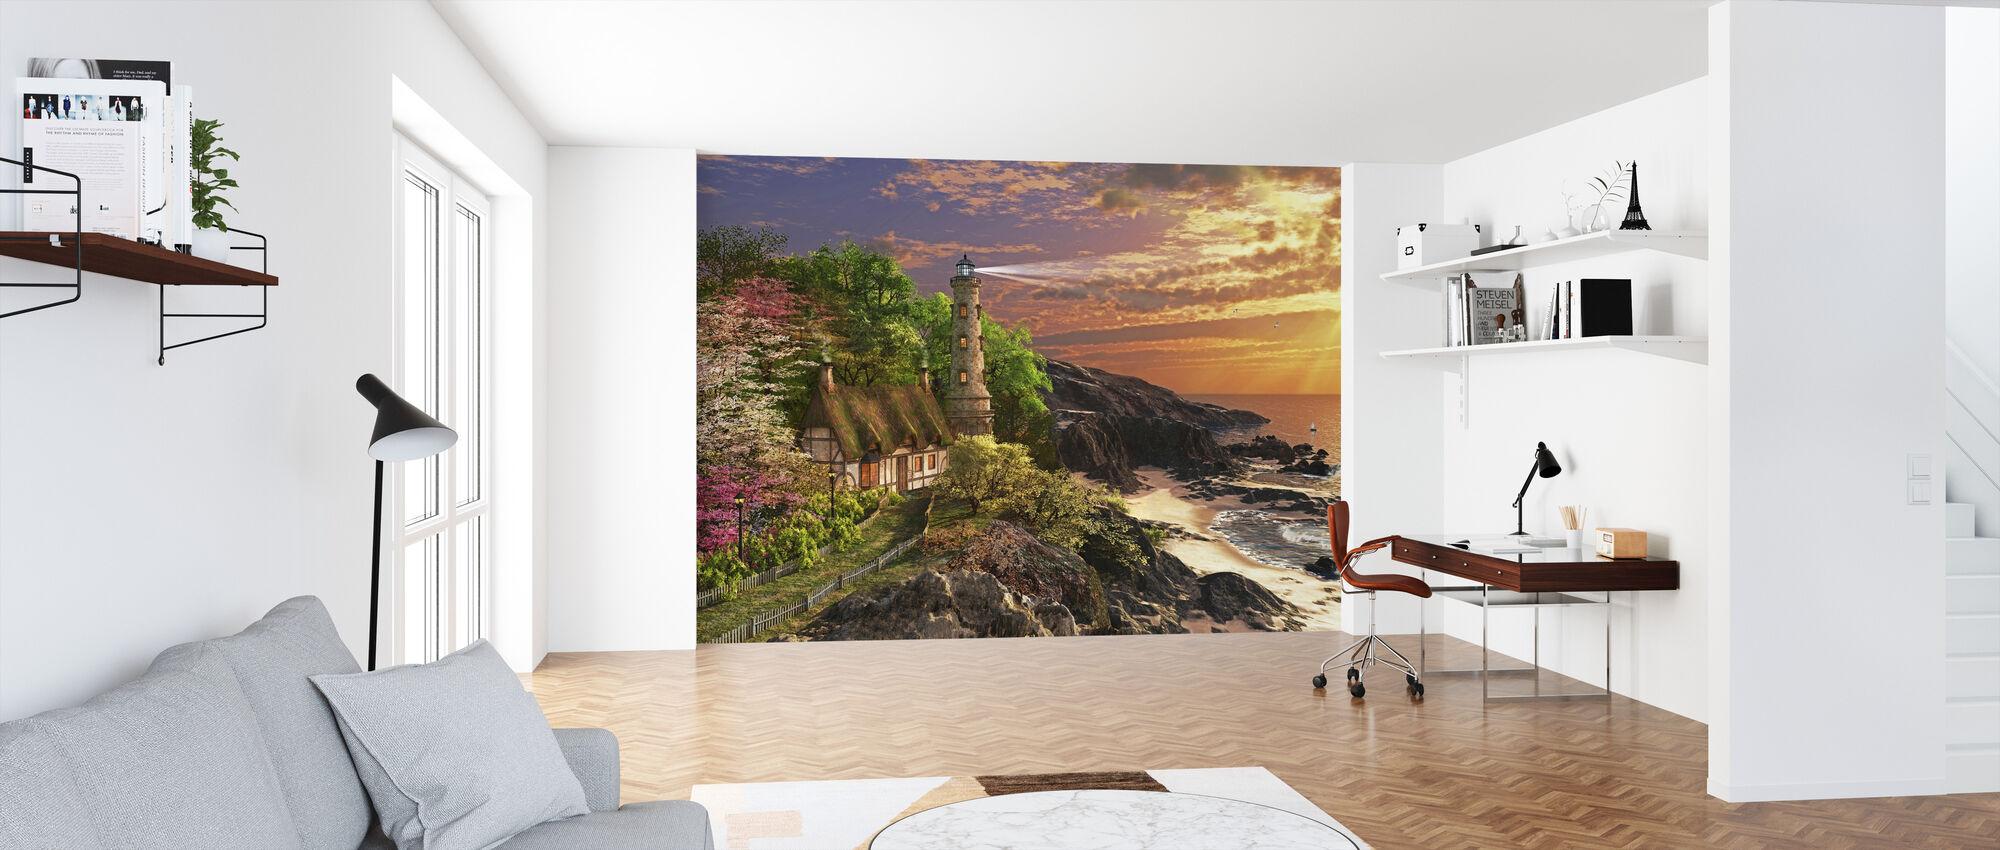 Stoney Cove - Wallpaper - Office